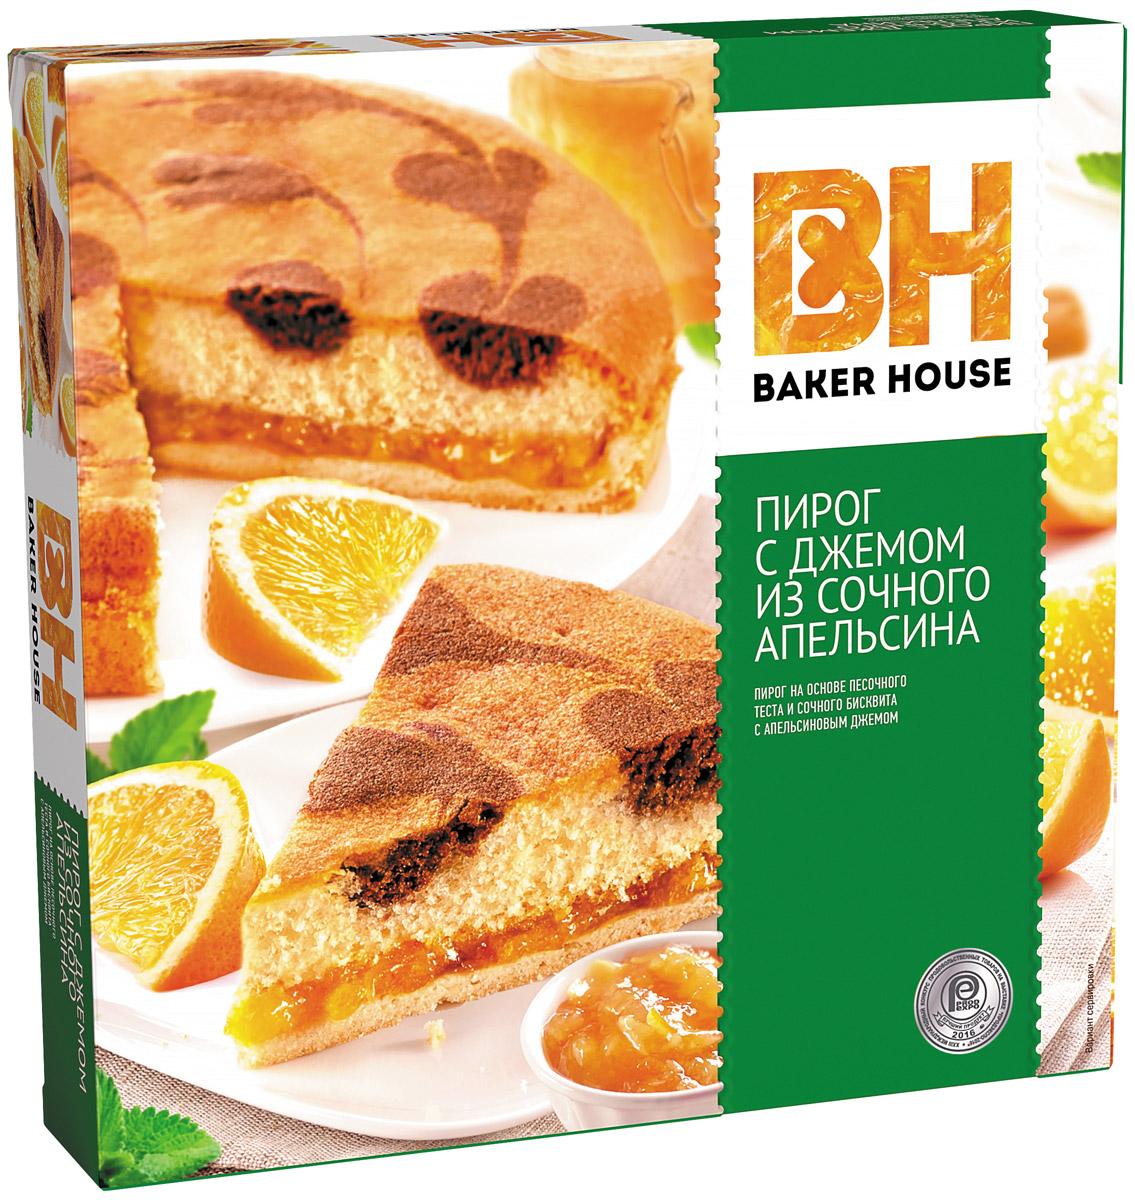 Baker House пирог апельсин, 550 г ростагроэкспорт желе апельсин 125 г